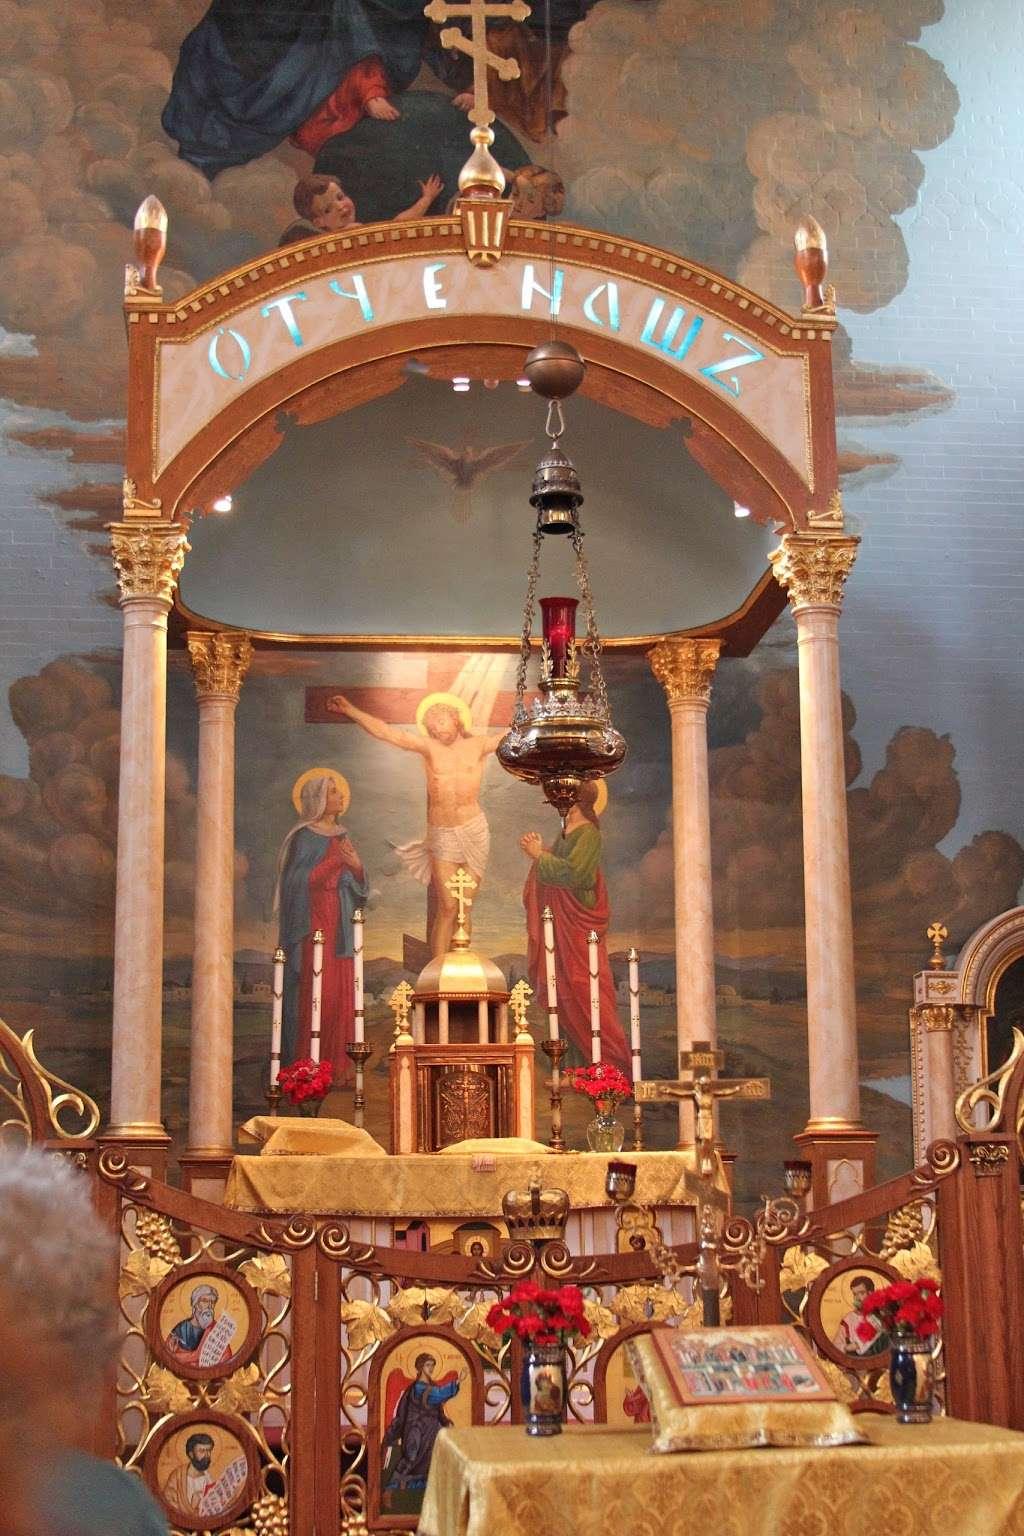 St Nicholas Carpatho Church | church | 288 E 10th St, New York, NY 10009, USA